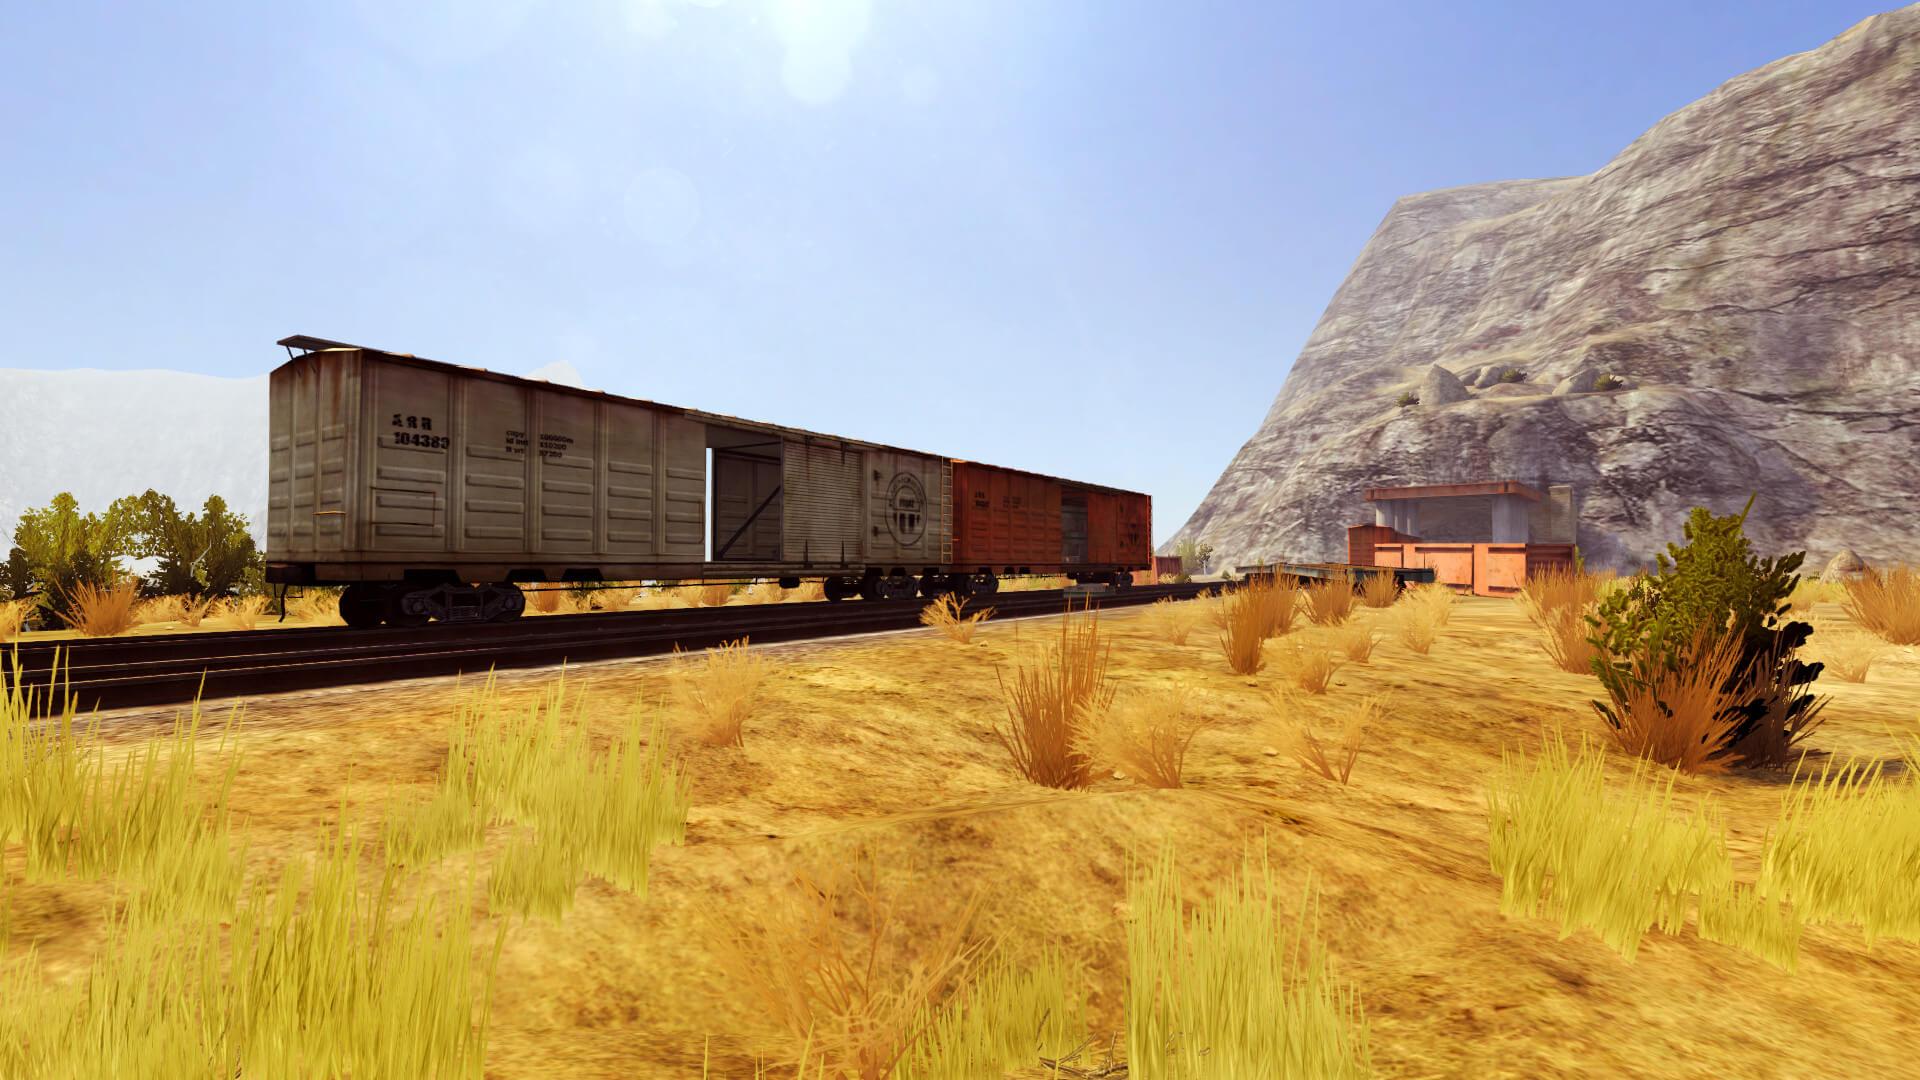 nwm_kgb_train